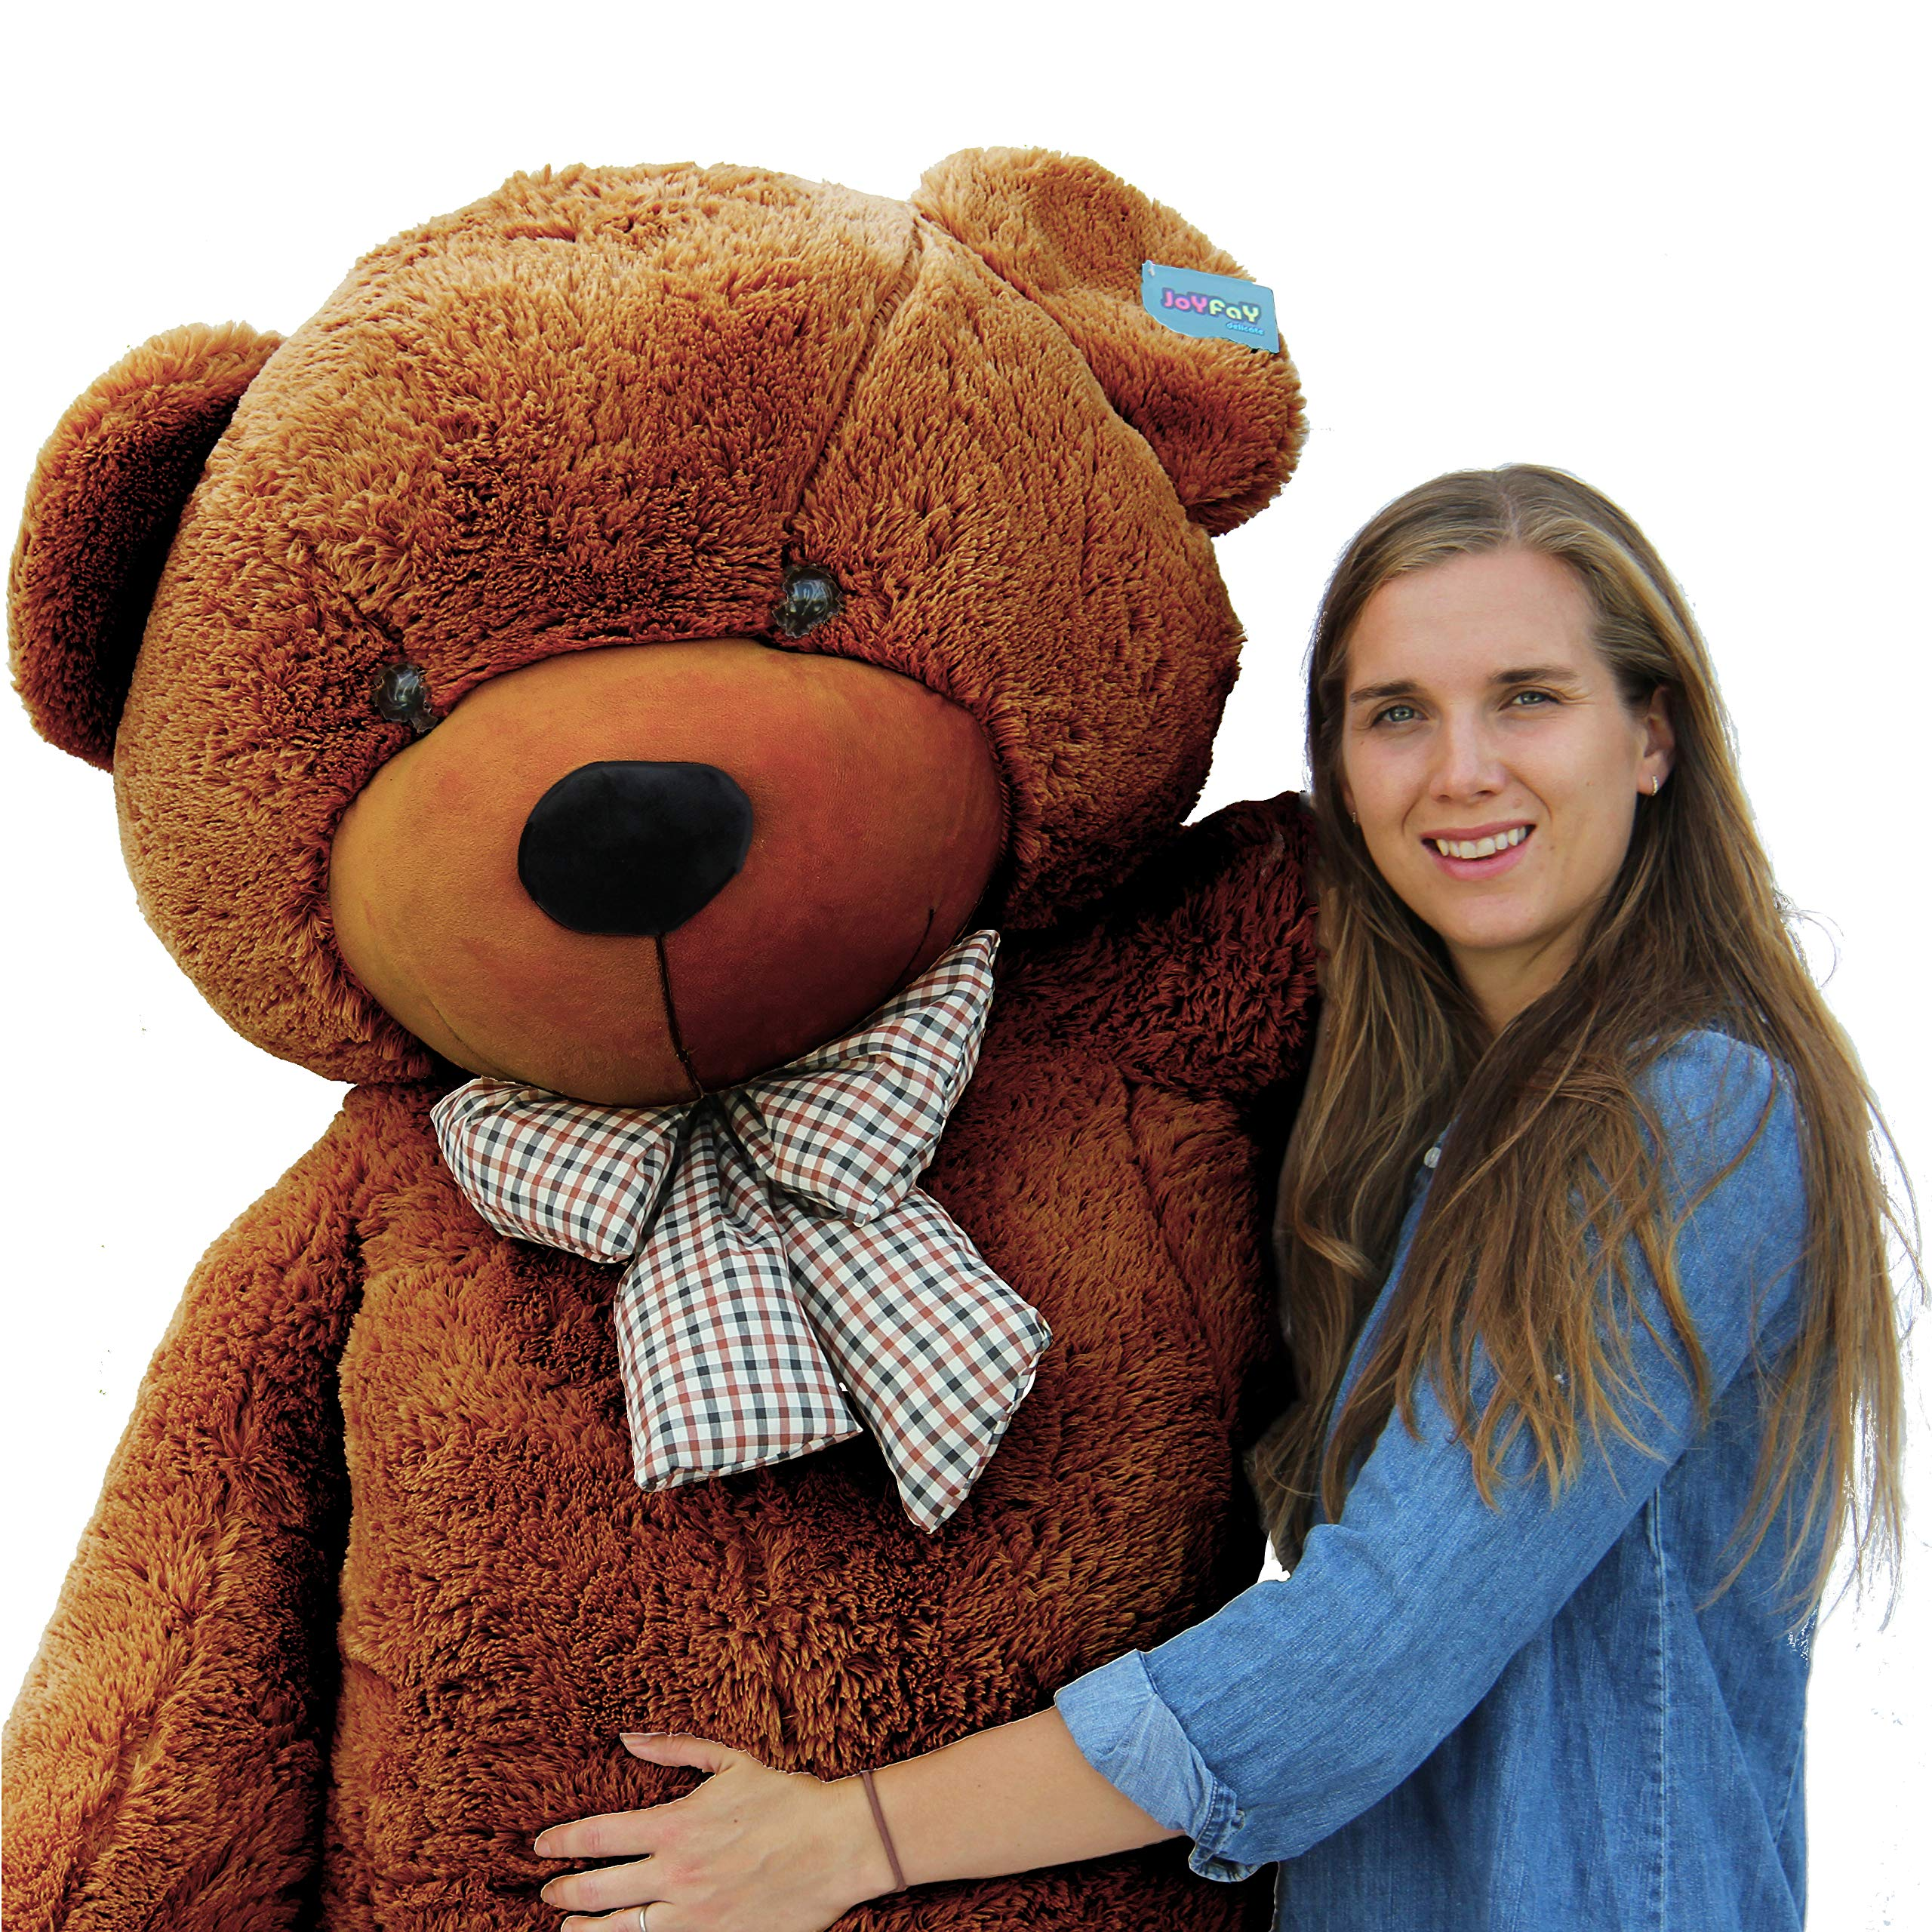 Joyfay 78'' Giant Teddy Bear Dark Brown Valentine's Gift by Joyfay